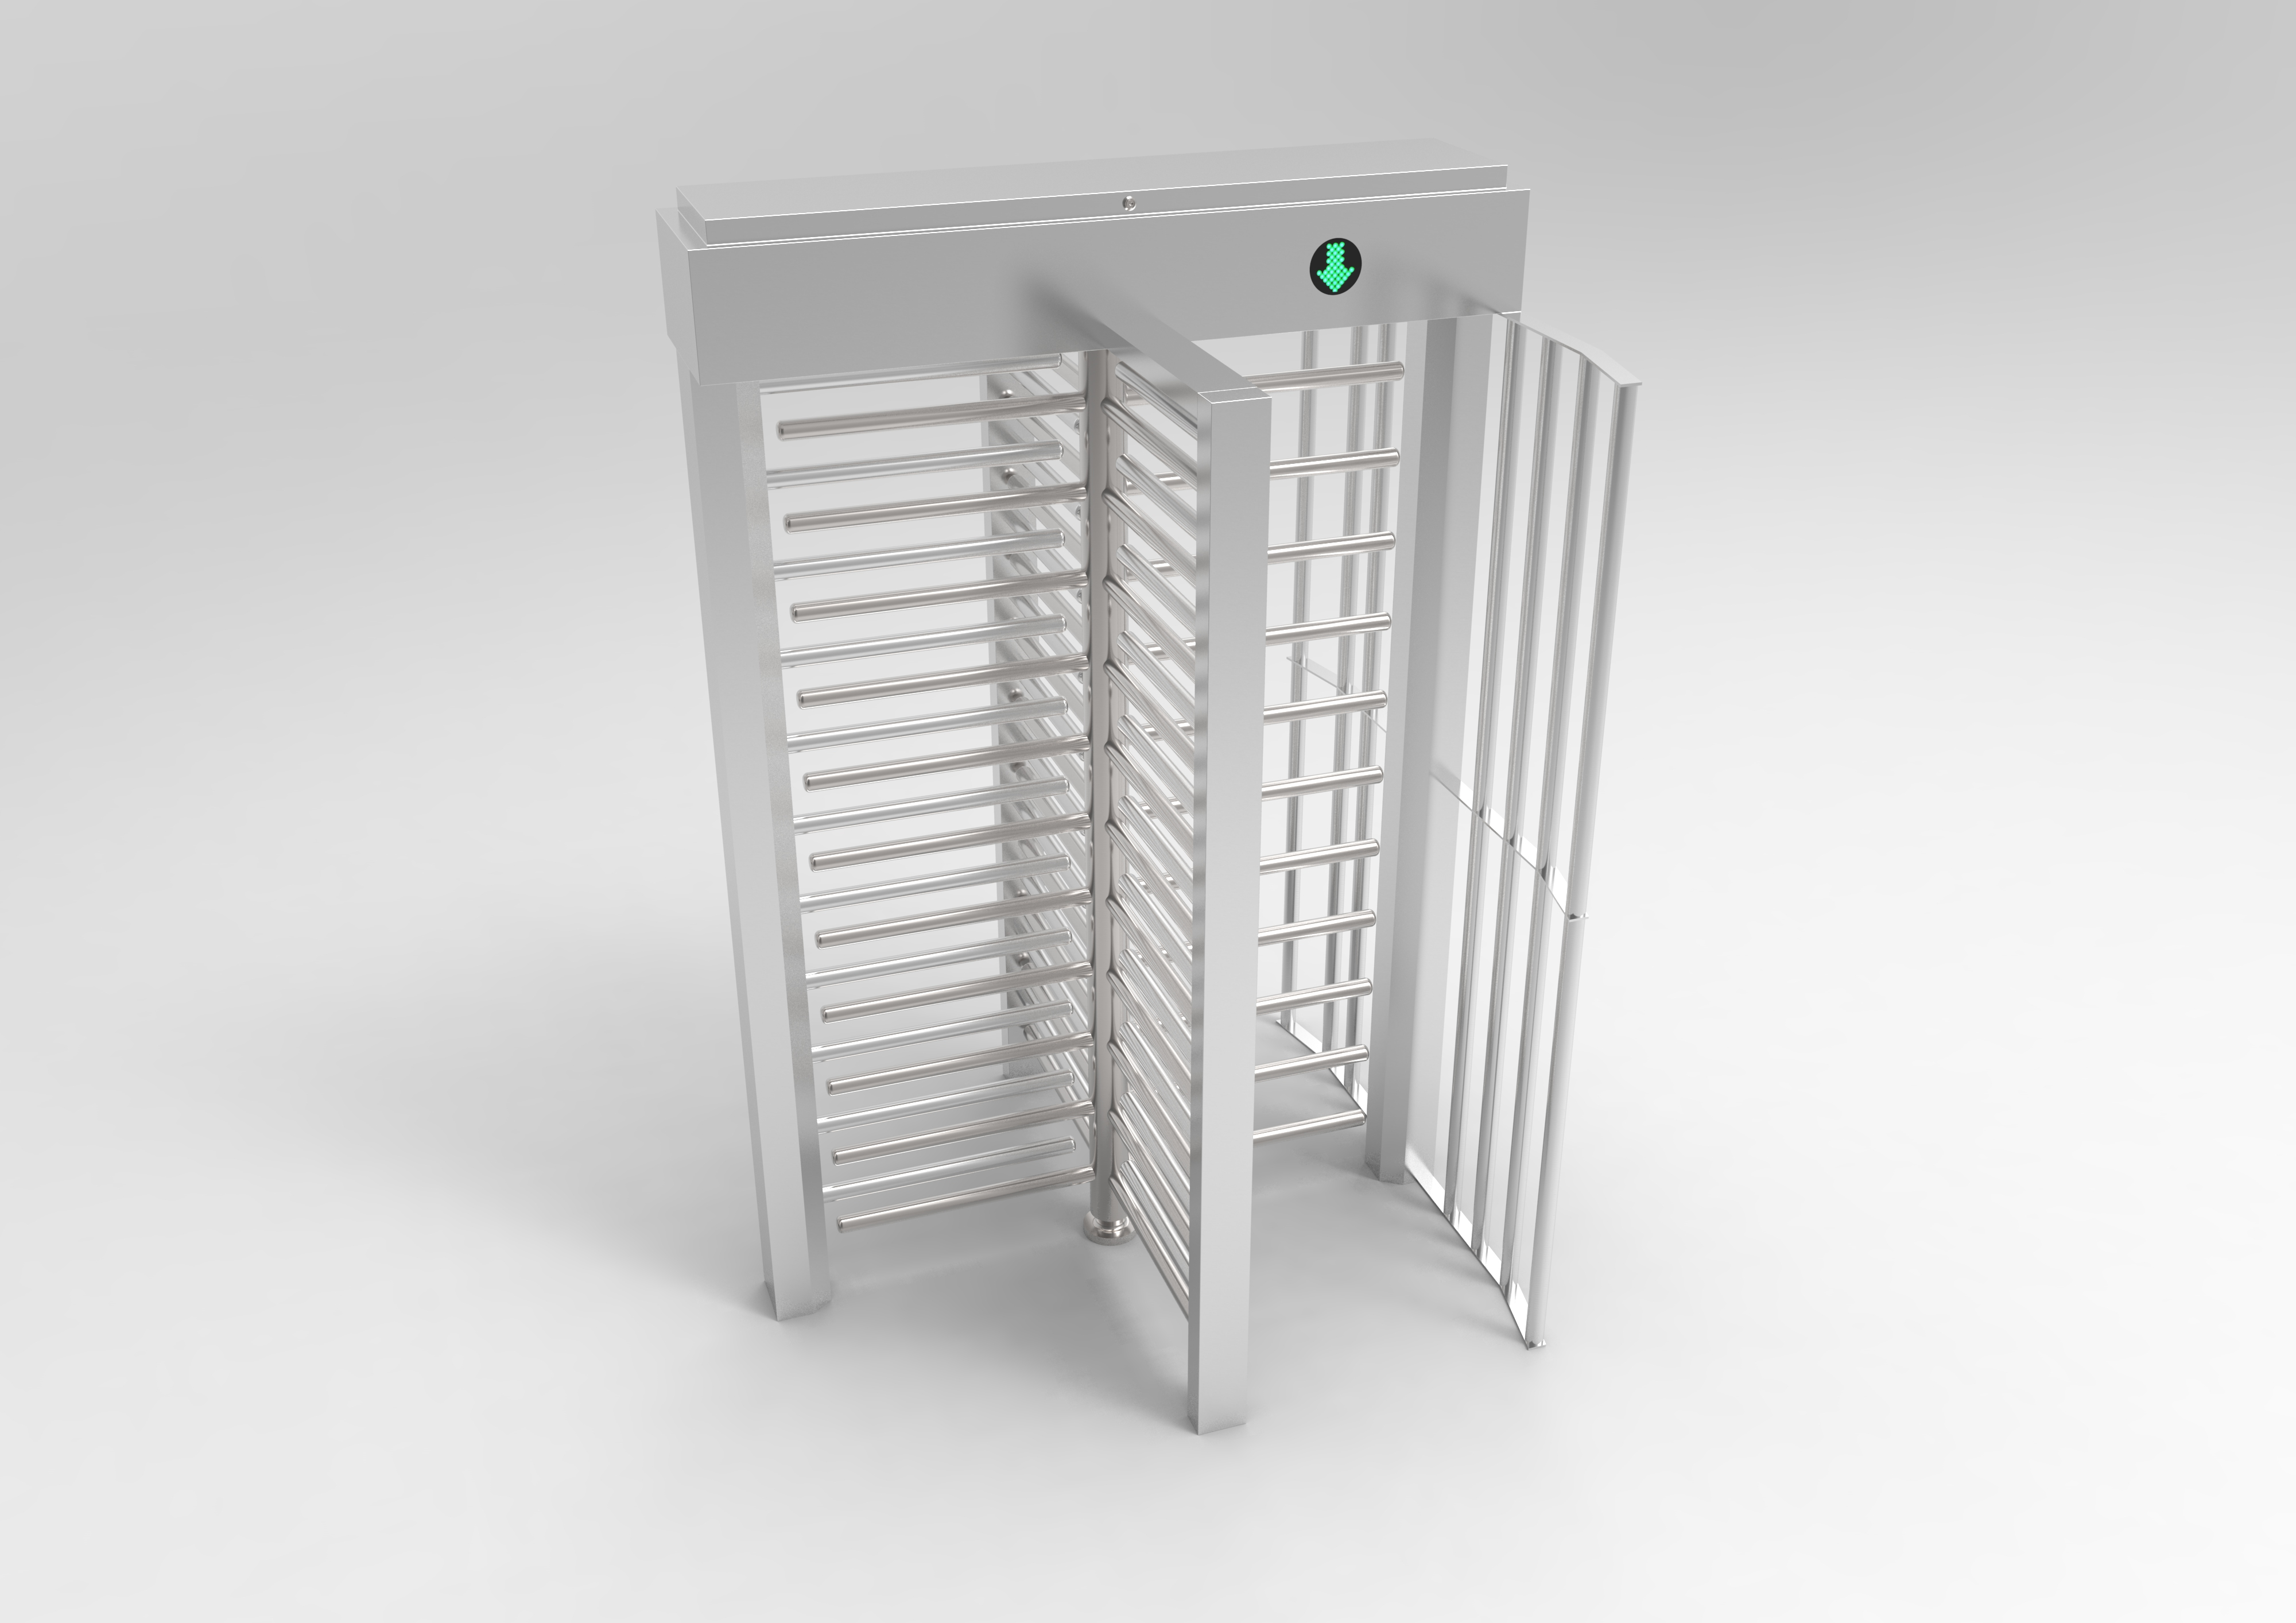 304 stainless steel school station Full Height Turnstile Gate outdoor